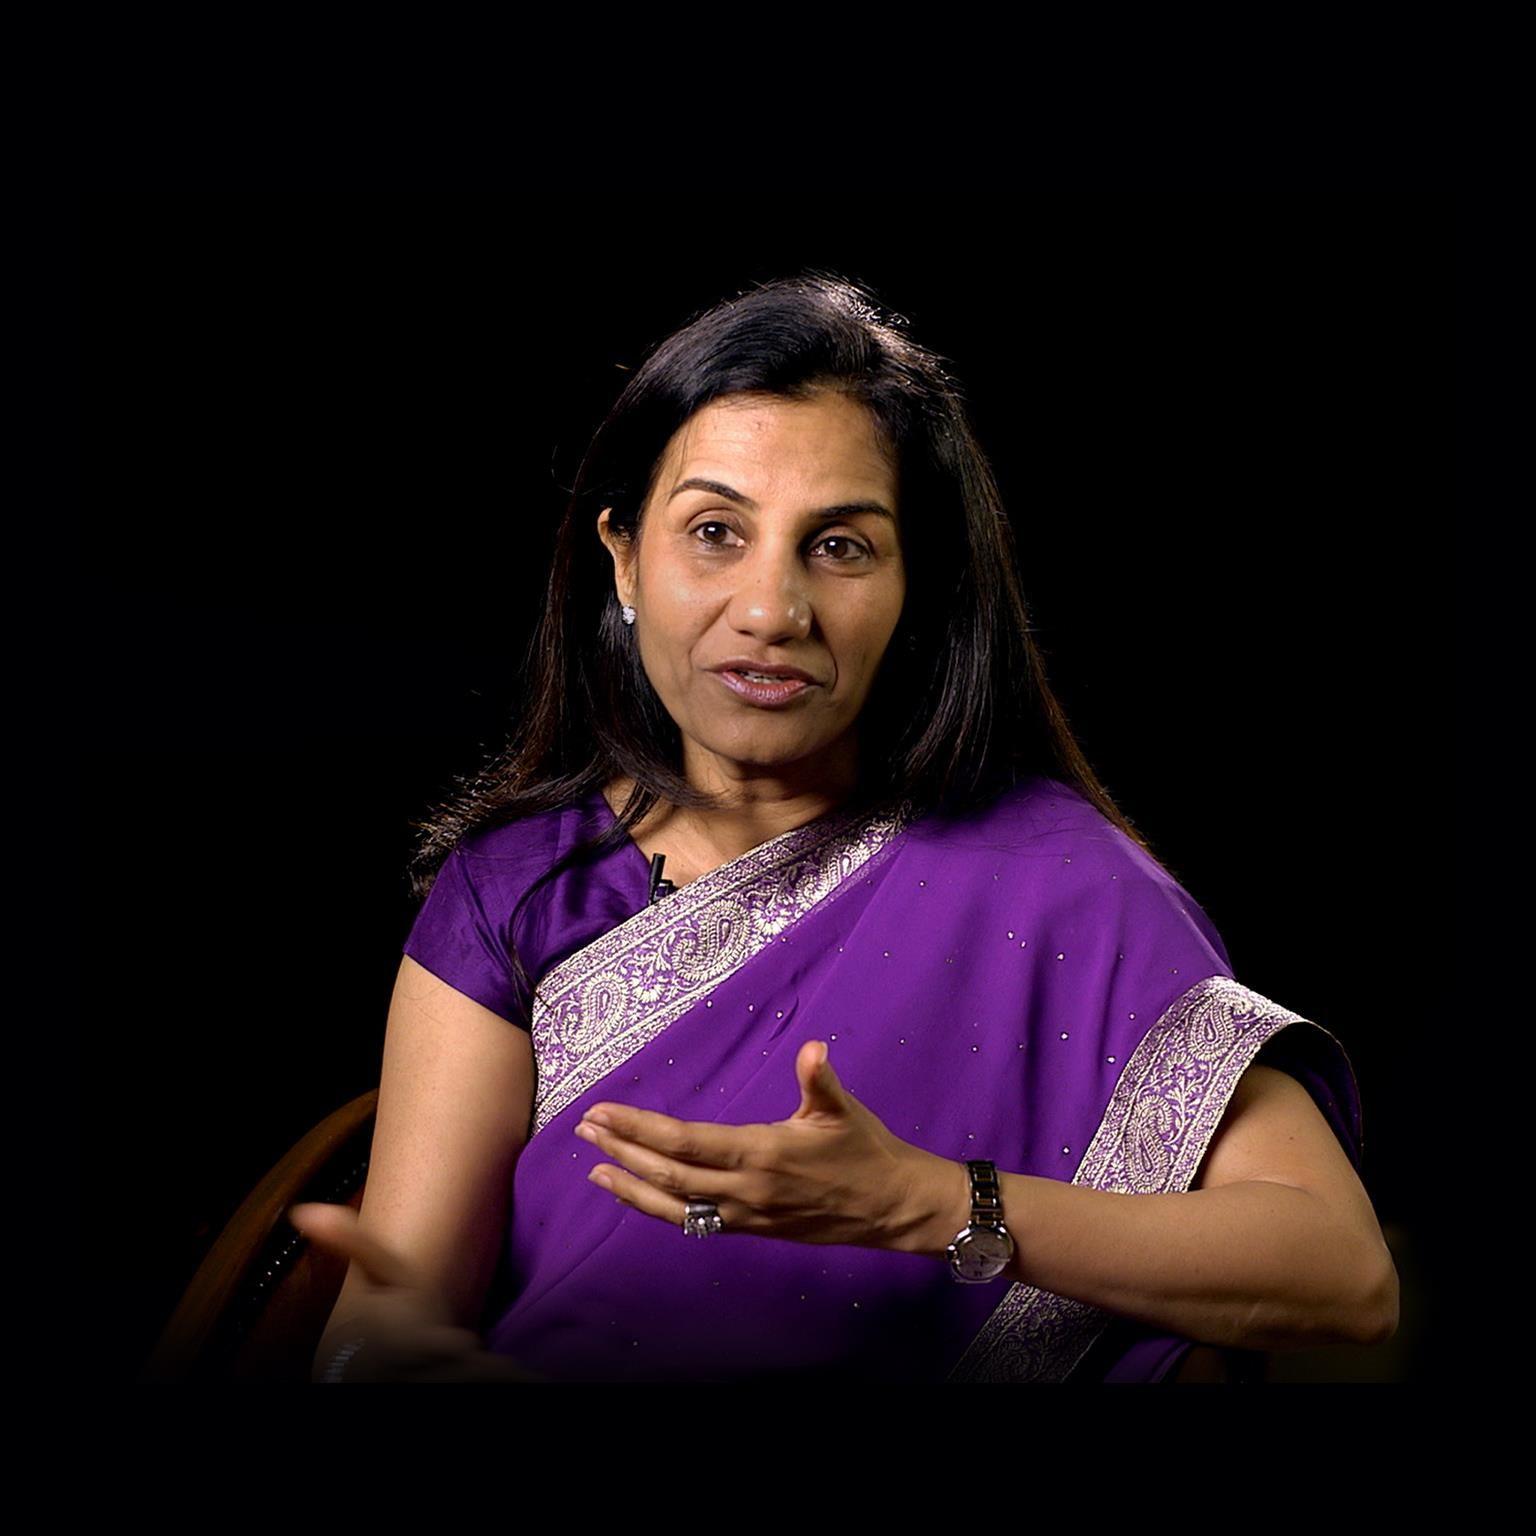 ICICI Bank managing director and CEO Chanda Kochhar talks